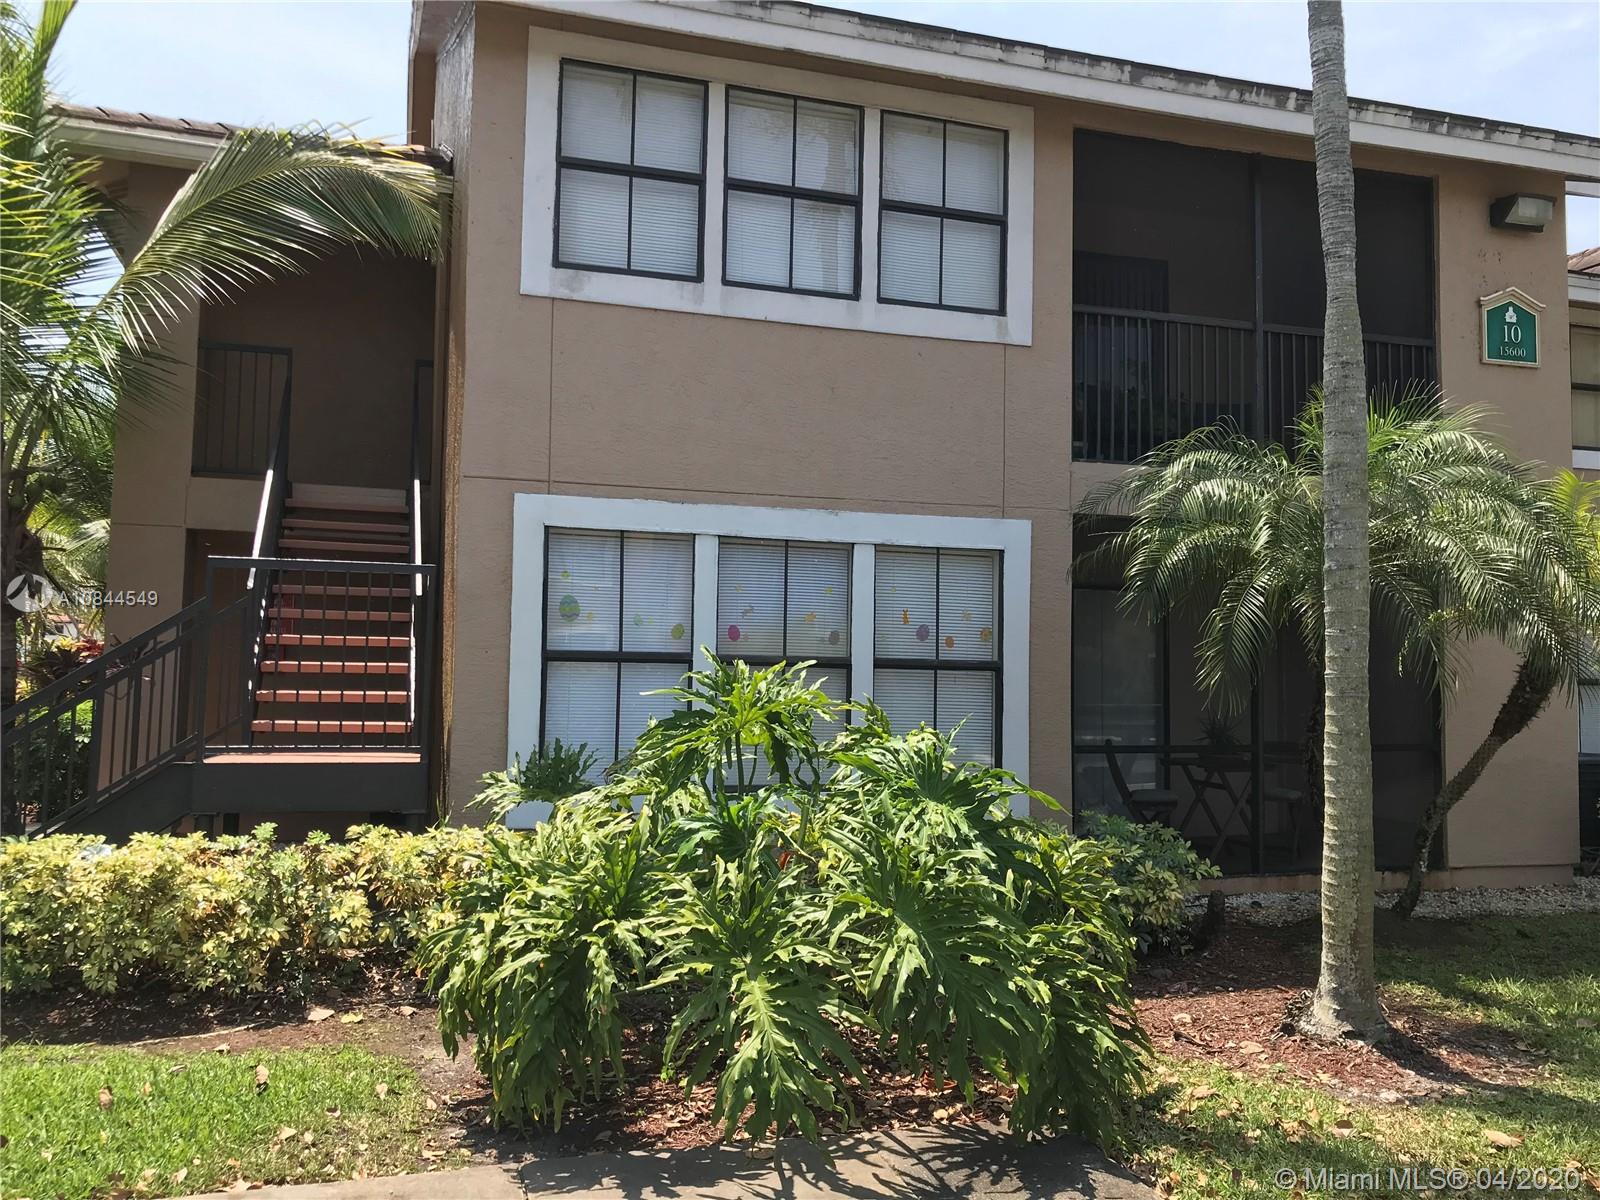 15600 SW 106 Lane # 1002, Miami, Florida 33196, 2 Bedrooms Bedrooms, ,2 BathroomsBathrooms,Residential,For Sale,15600 SW 106 Lane # 1002,A10844549